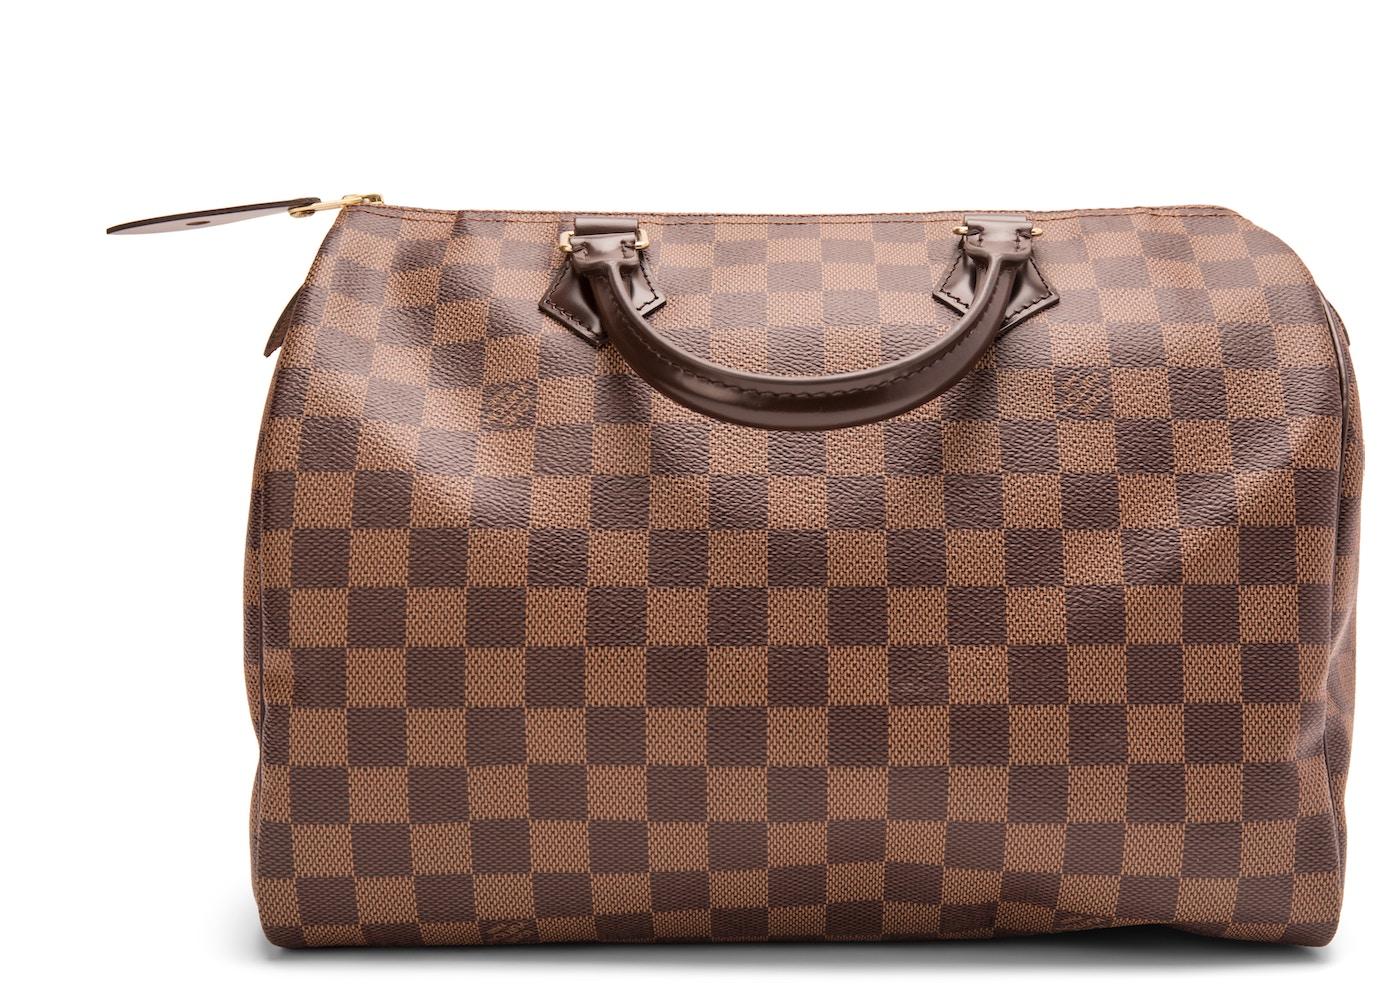 bc4190bf2a9f Louis Vuitton Speedy Damier Ebene 30 Brown